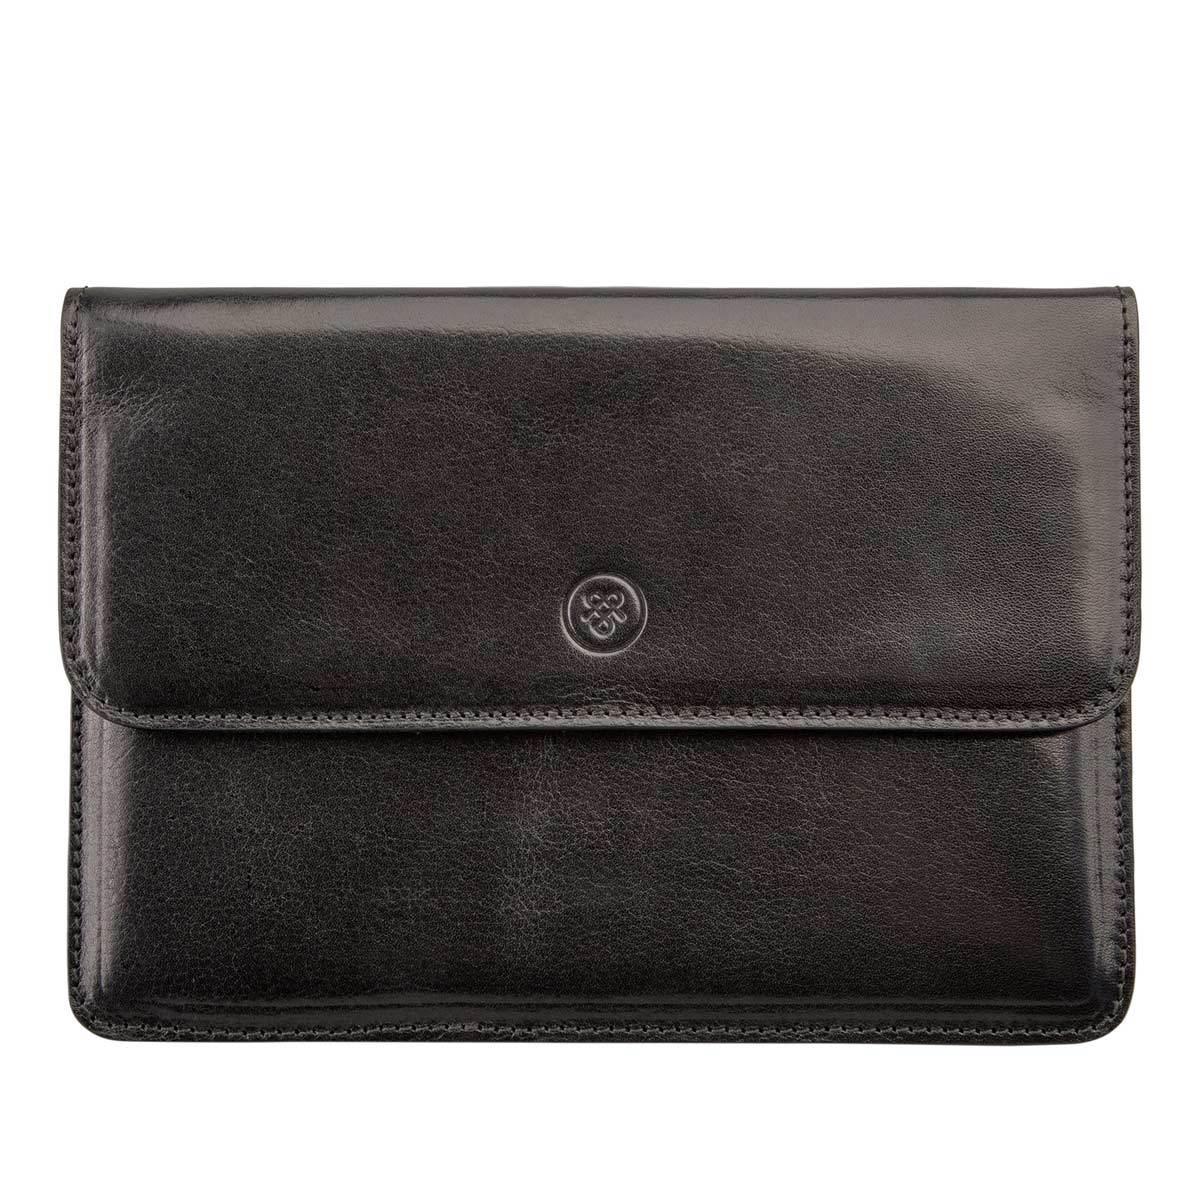 MAXWELL SCOTT BAGS High Quality Black Italian Leather Travel Wallet